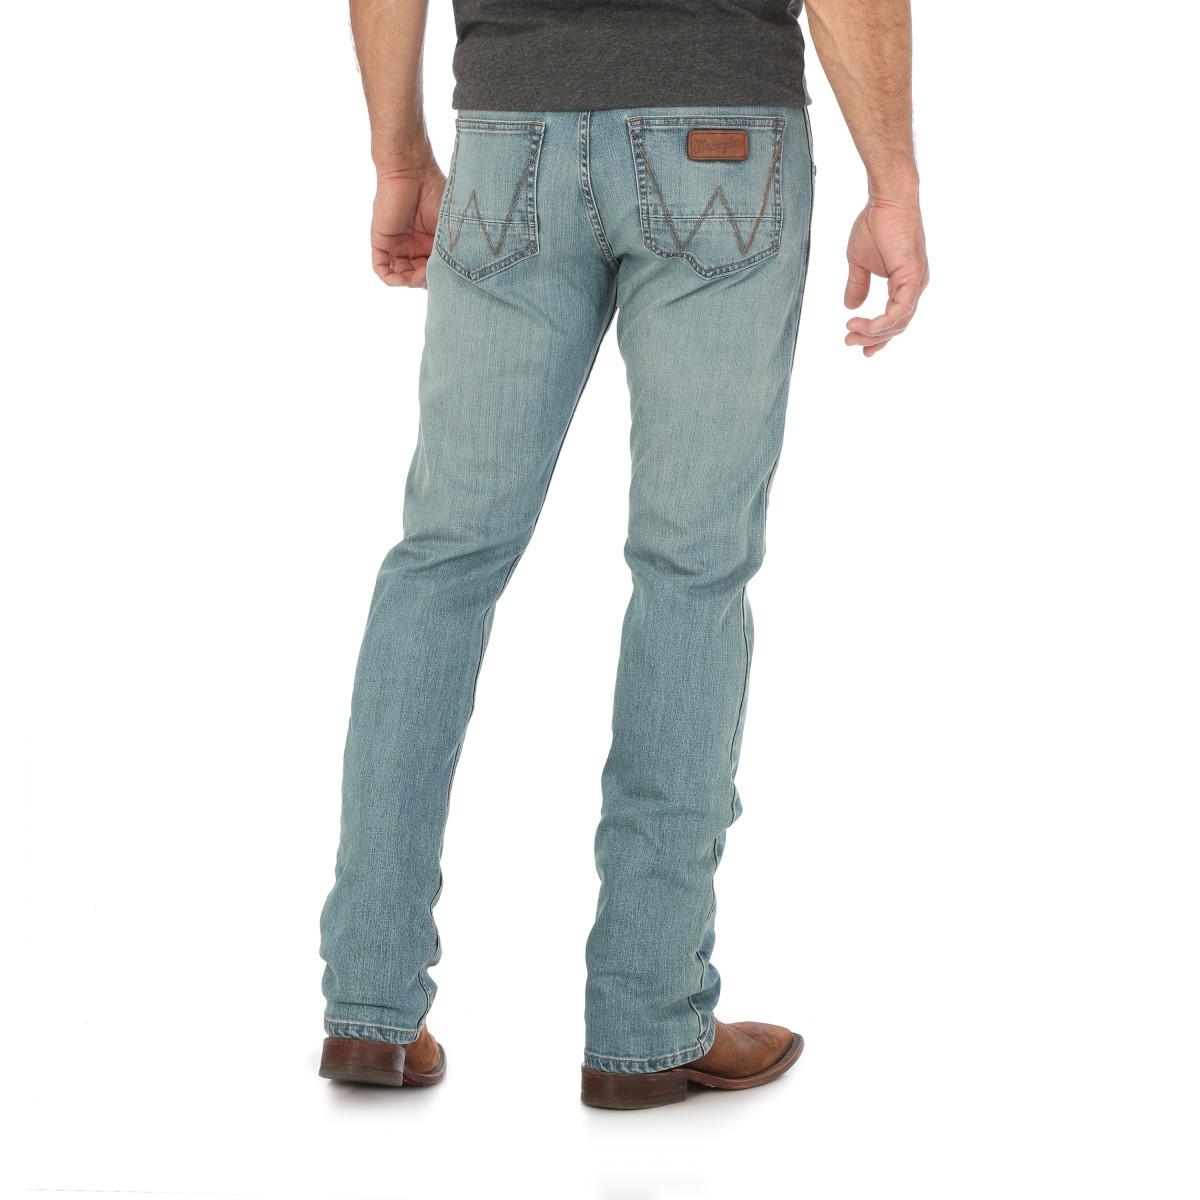 37c33a8a ... Wrangler Retro® Slim Straight Jean light Wash. Image 1 · Image 1 ·  Image 2 ...